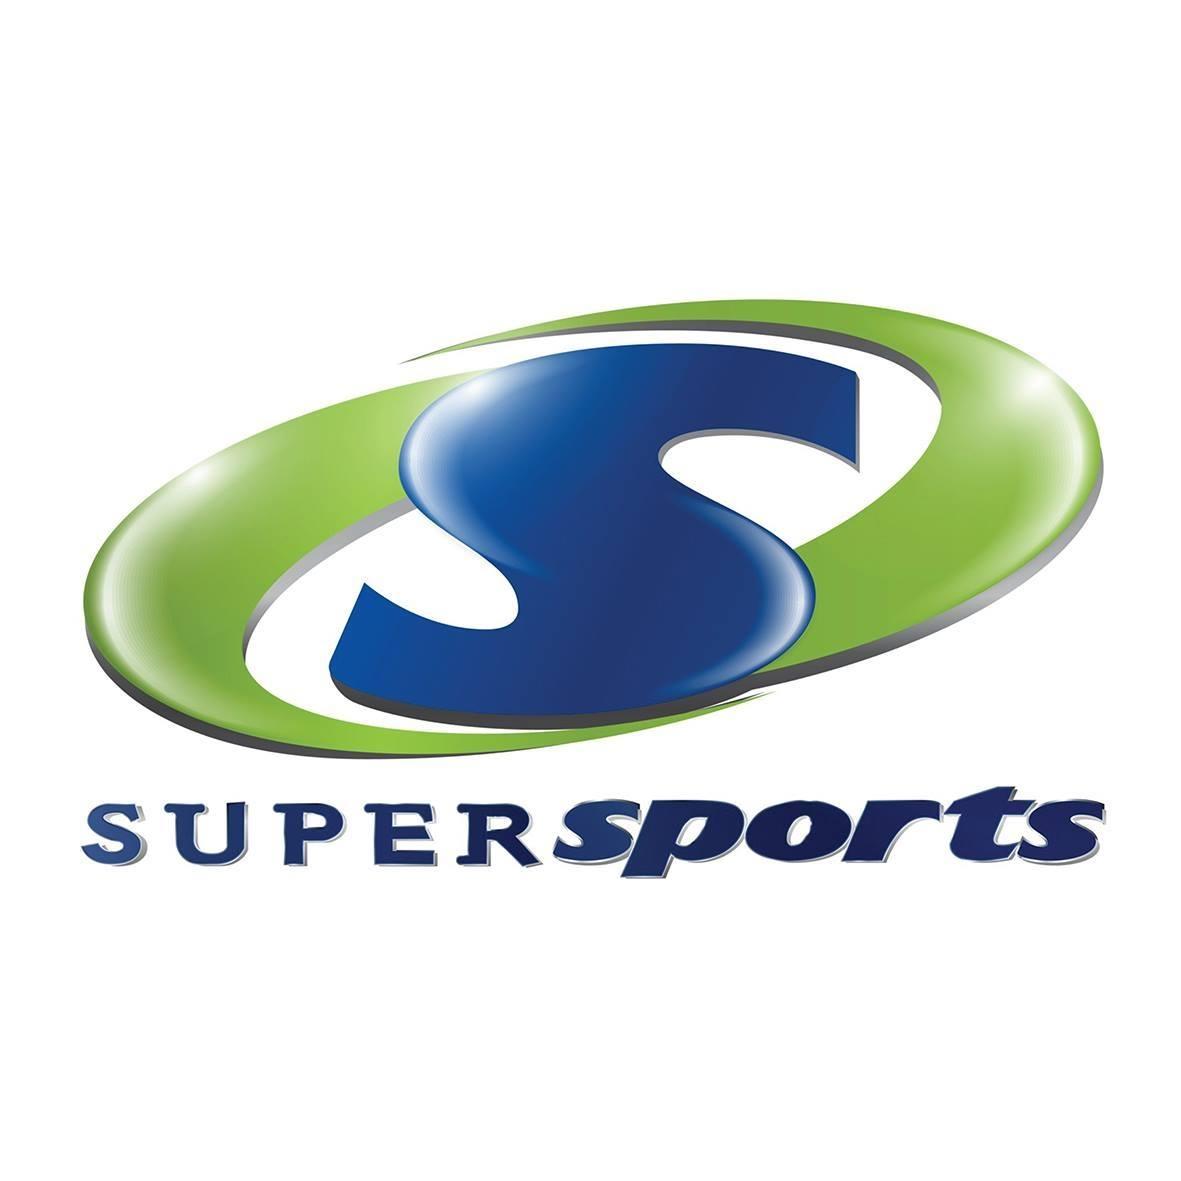 Supersport แจกโค้ดส่วนลด 10% เมื่อสั่งซื้อ SKECHER GO RUN